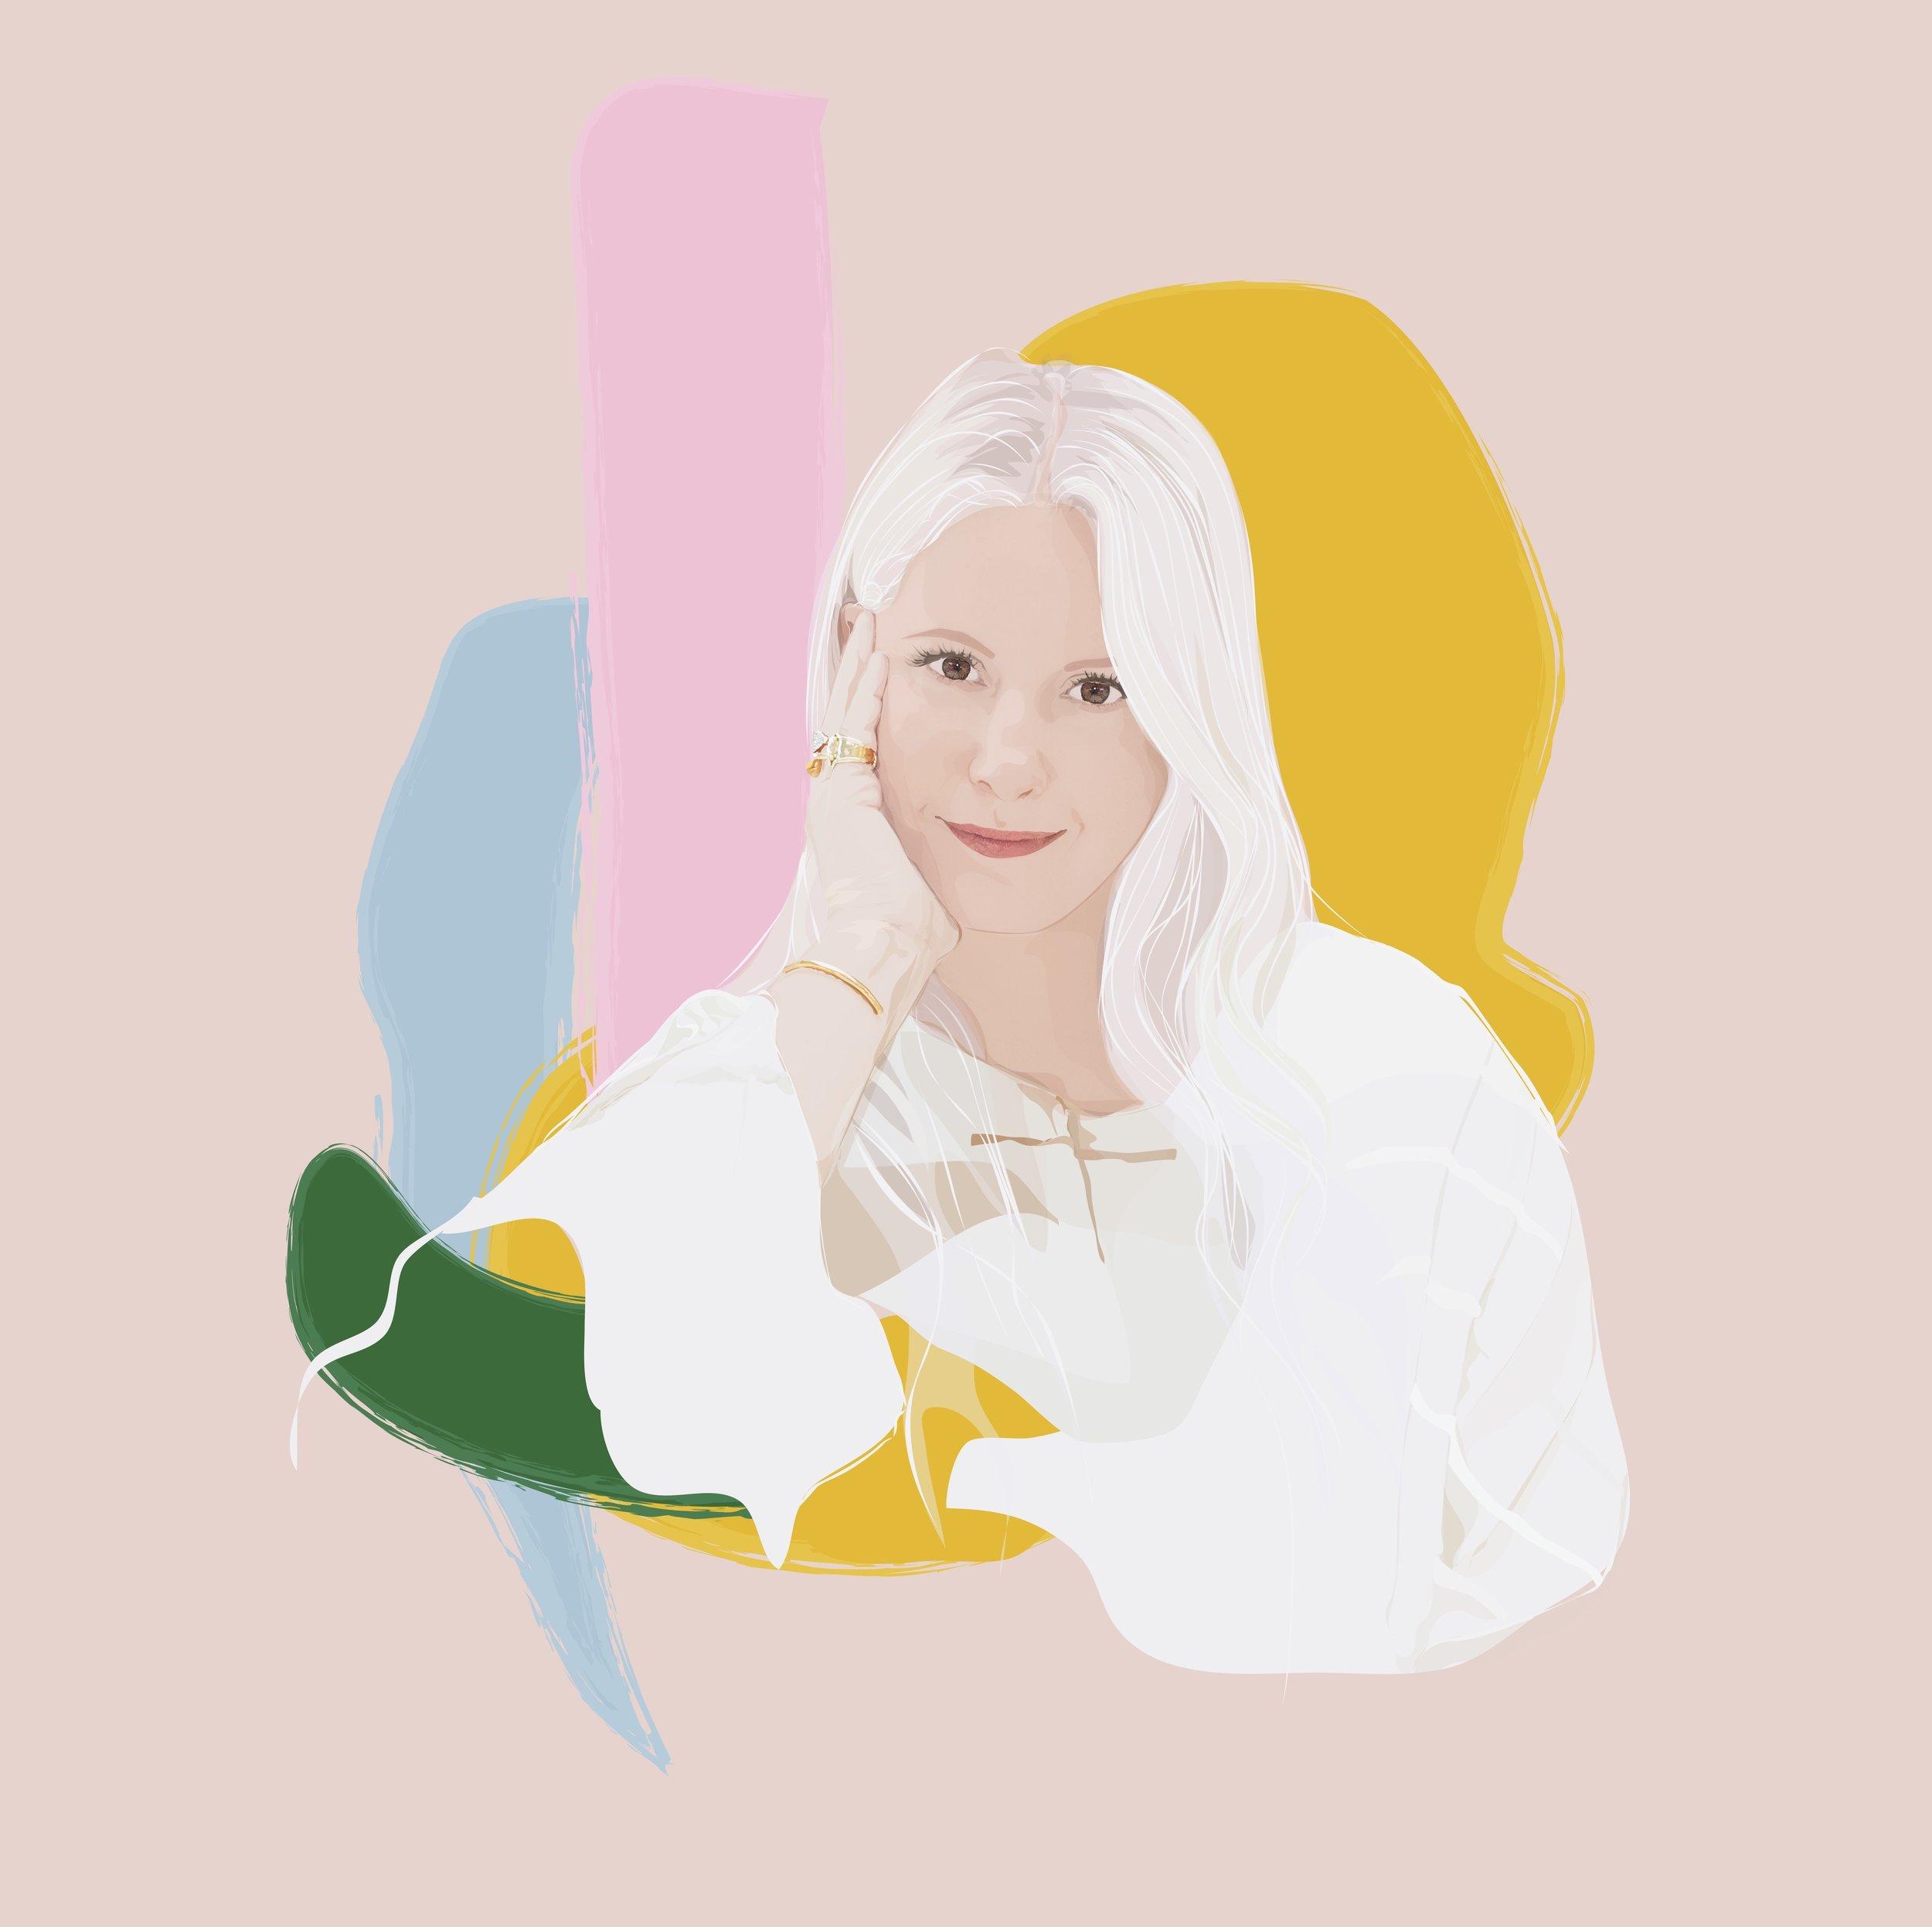 Erin Kleinberg x Femme Studios